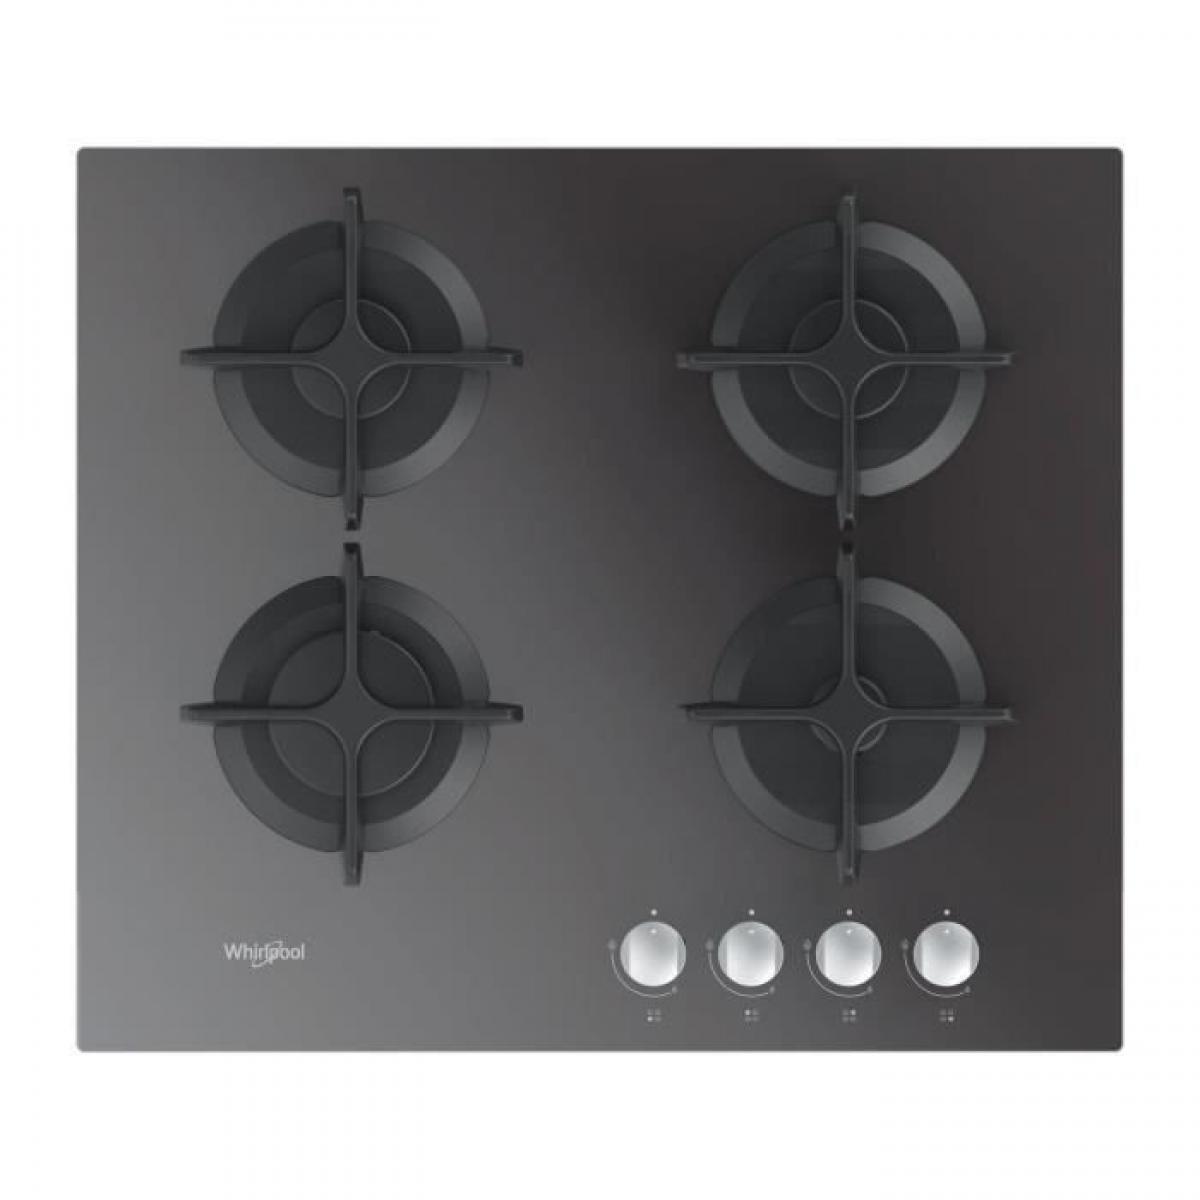 whirlpool WHIRLPOOL - Table gaz verre miroir - 60 cm